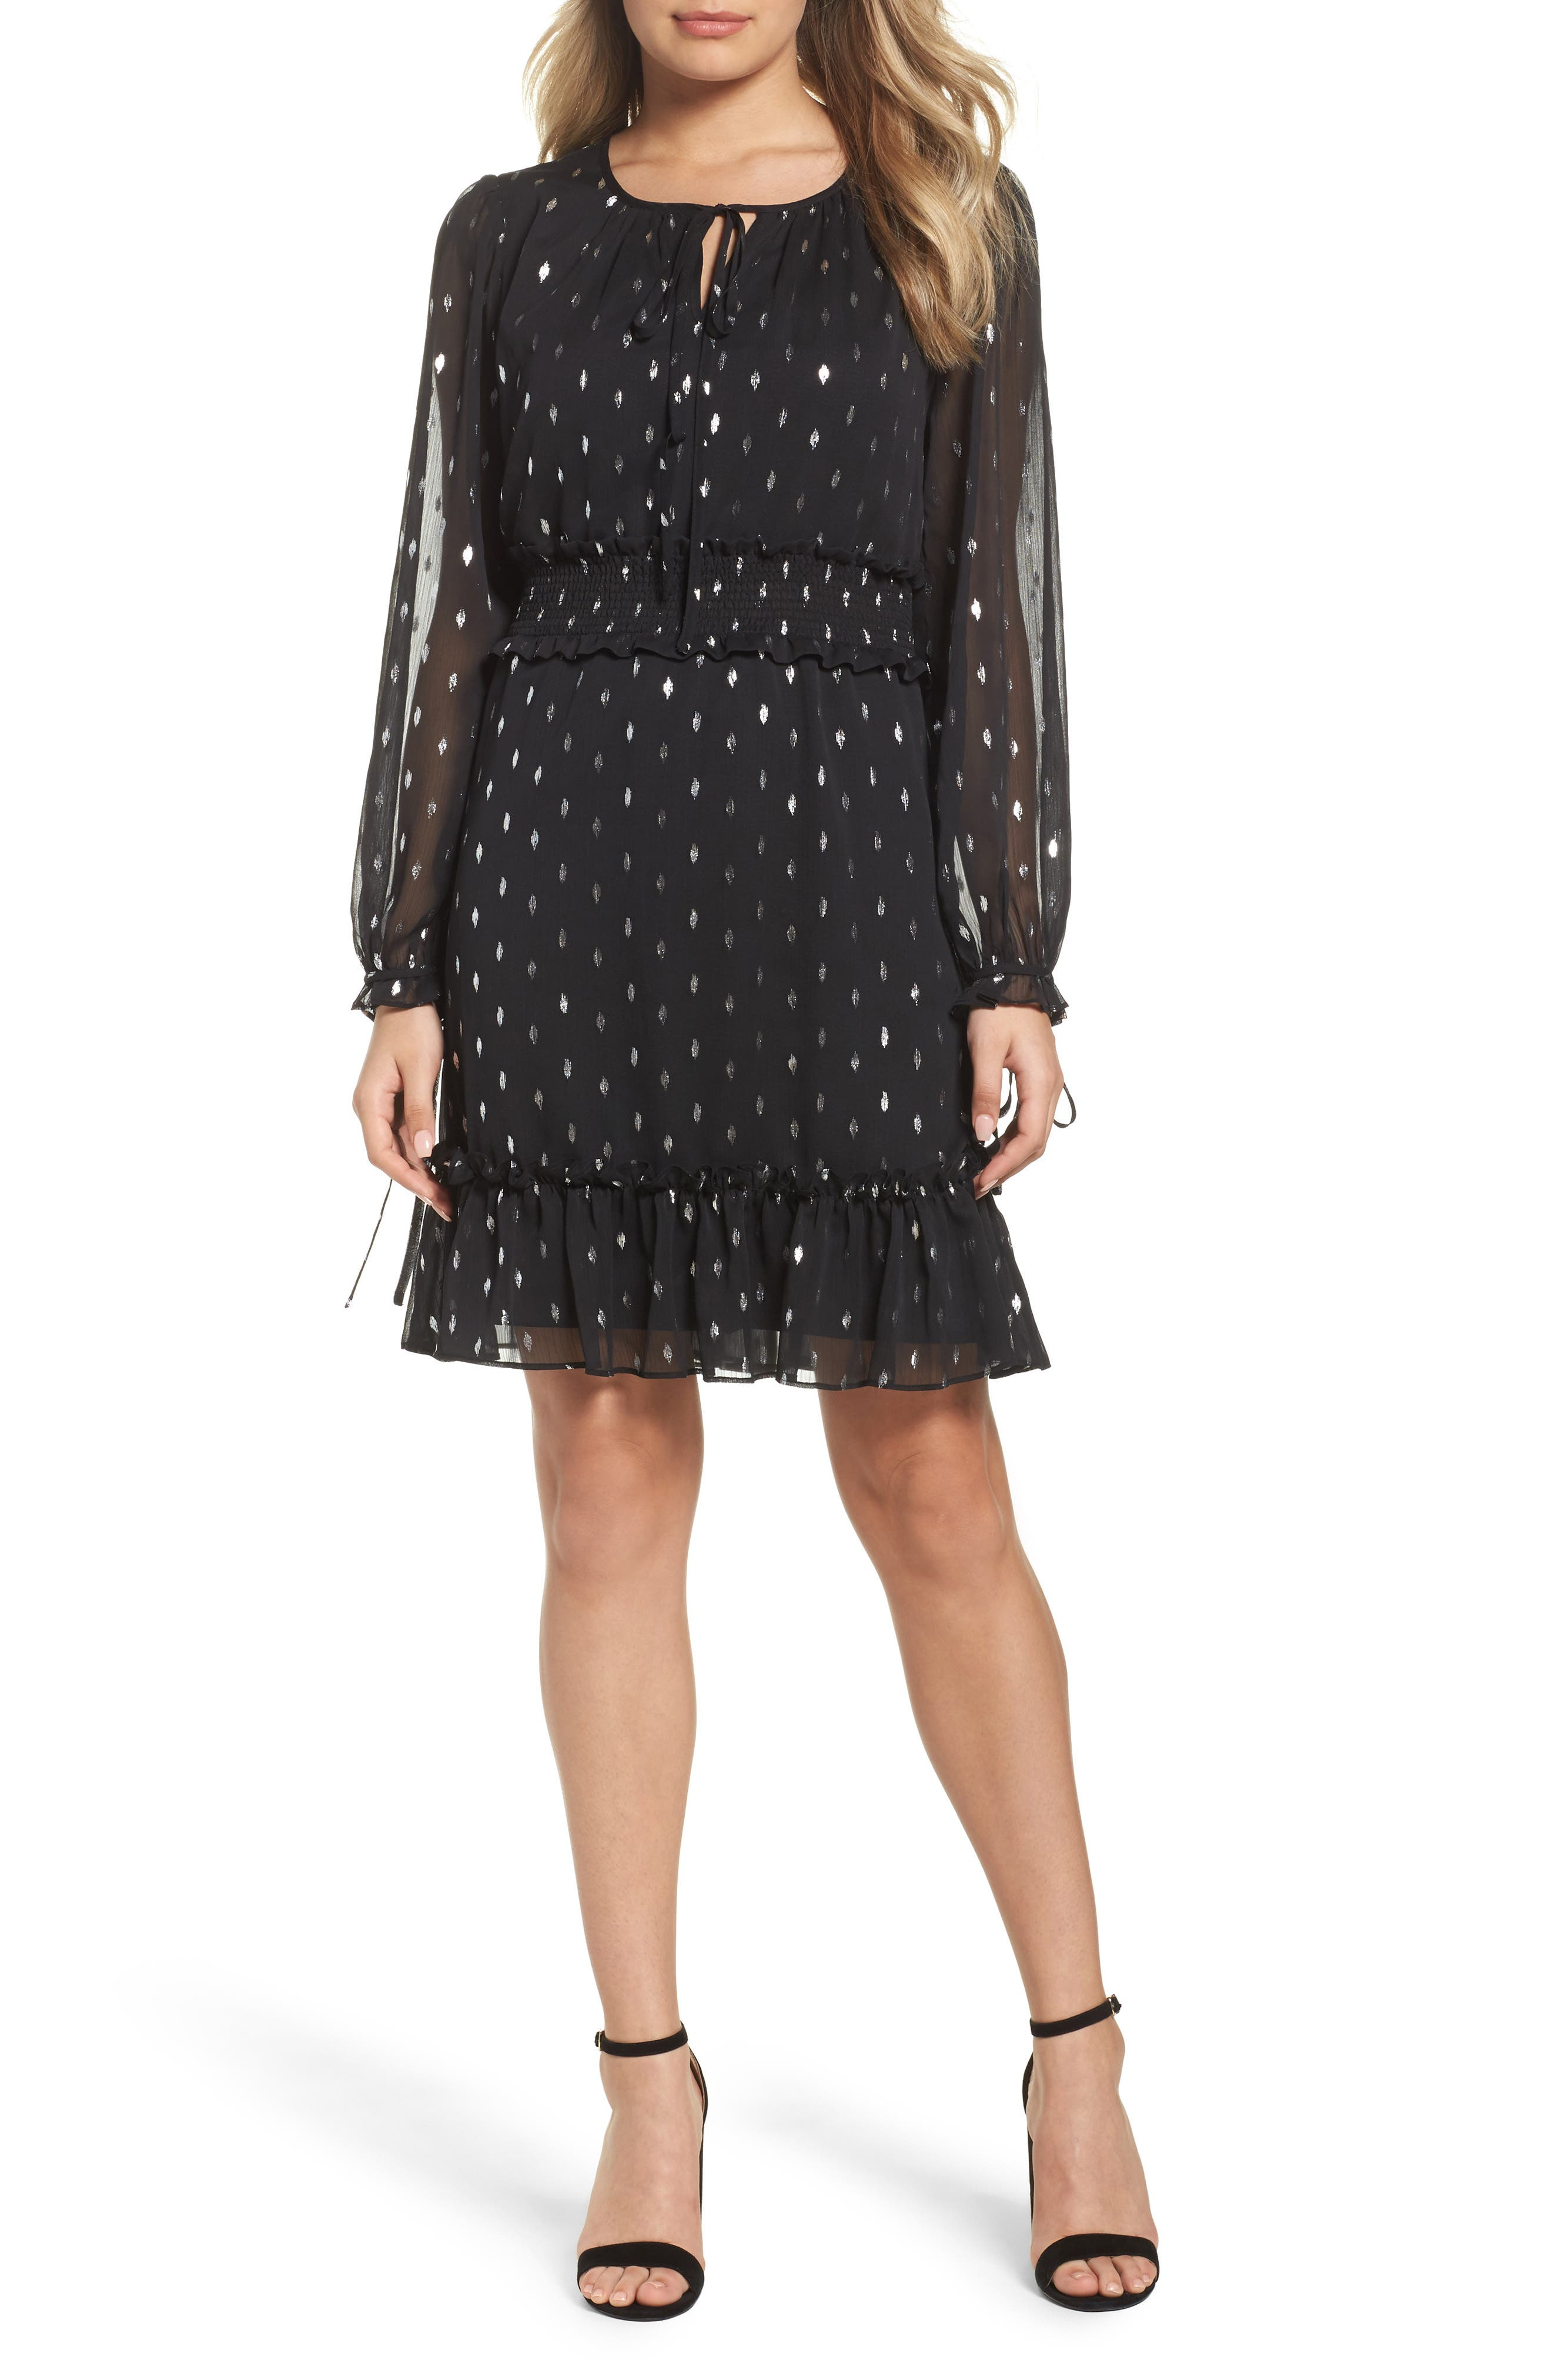 Alternate Image 1 Selected - Chelsea28 Metallic Smocked Dress